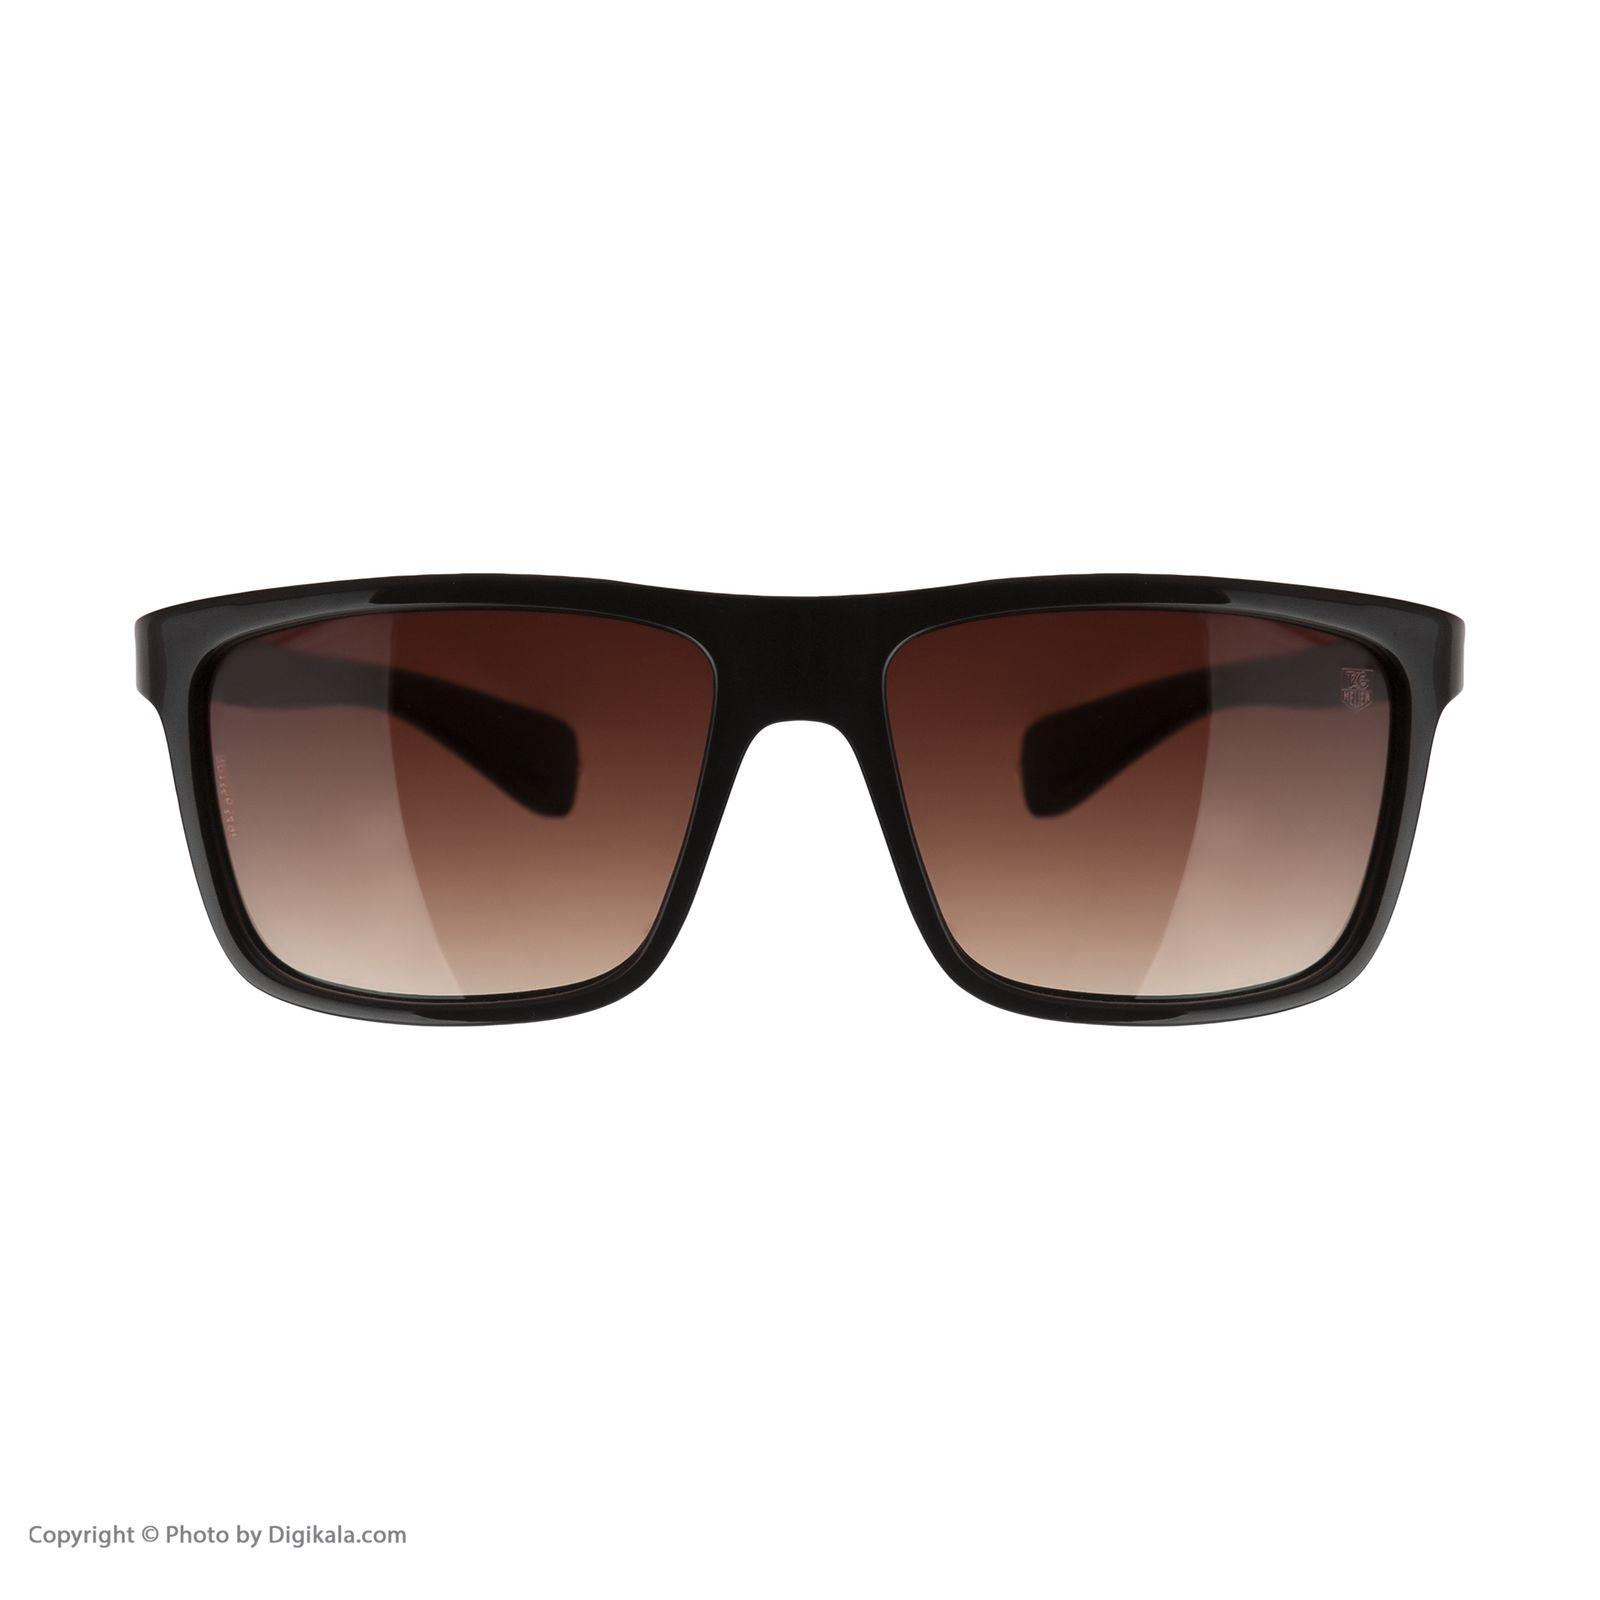 عینک آفتابی تگ هویر مدل 9303 -  - 3